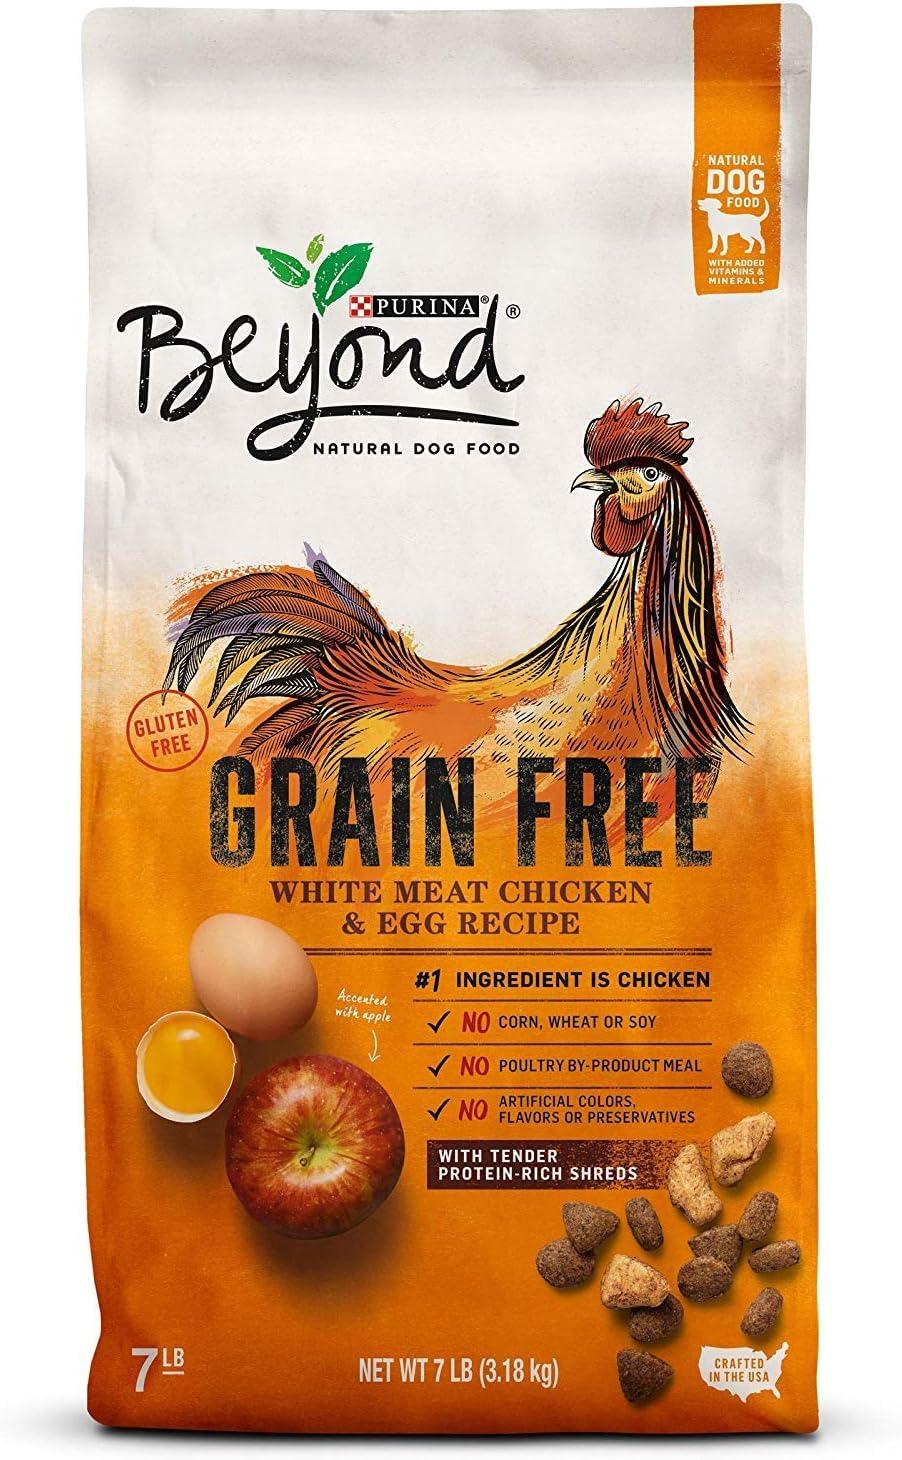 Purina Beyond Grain Free, Natural Dry Dog Food; Grain Free White Meat Chicken & Egg Recipe - 7 lb. Bag